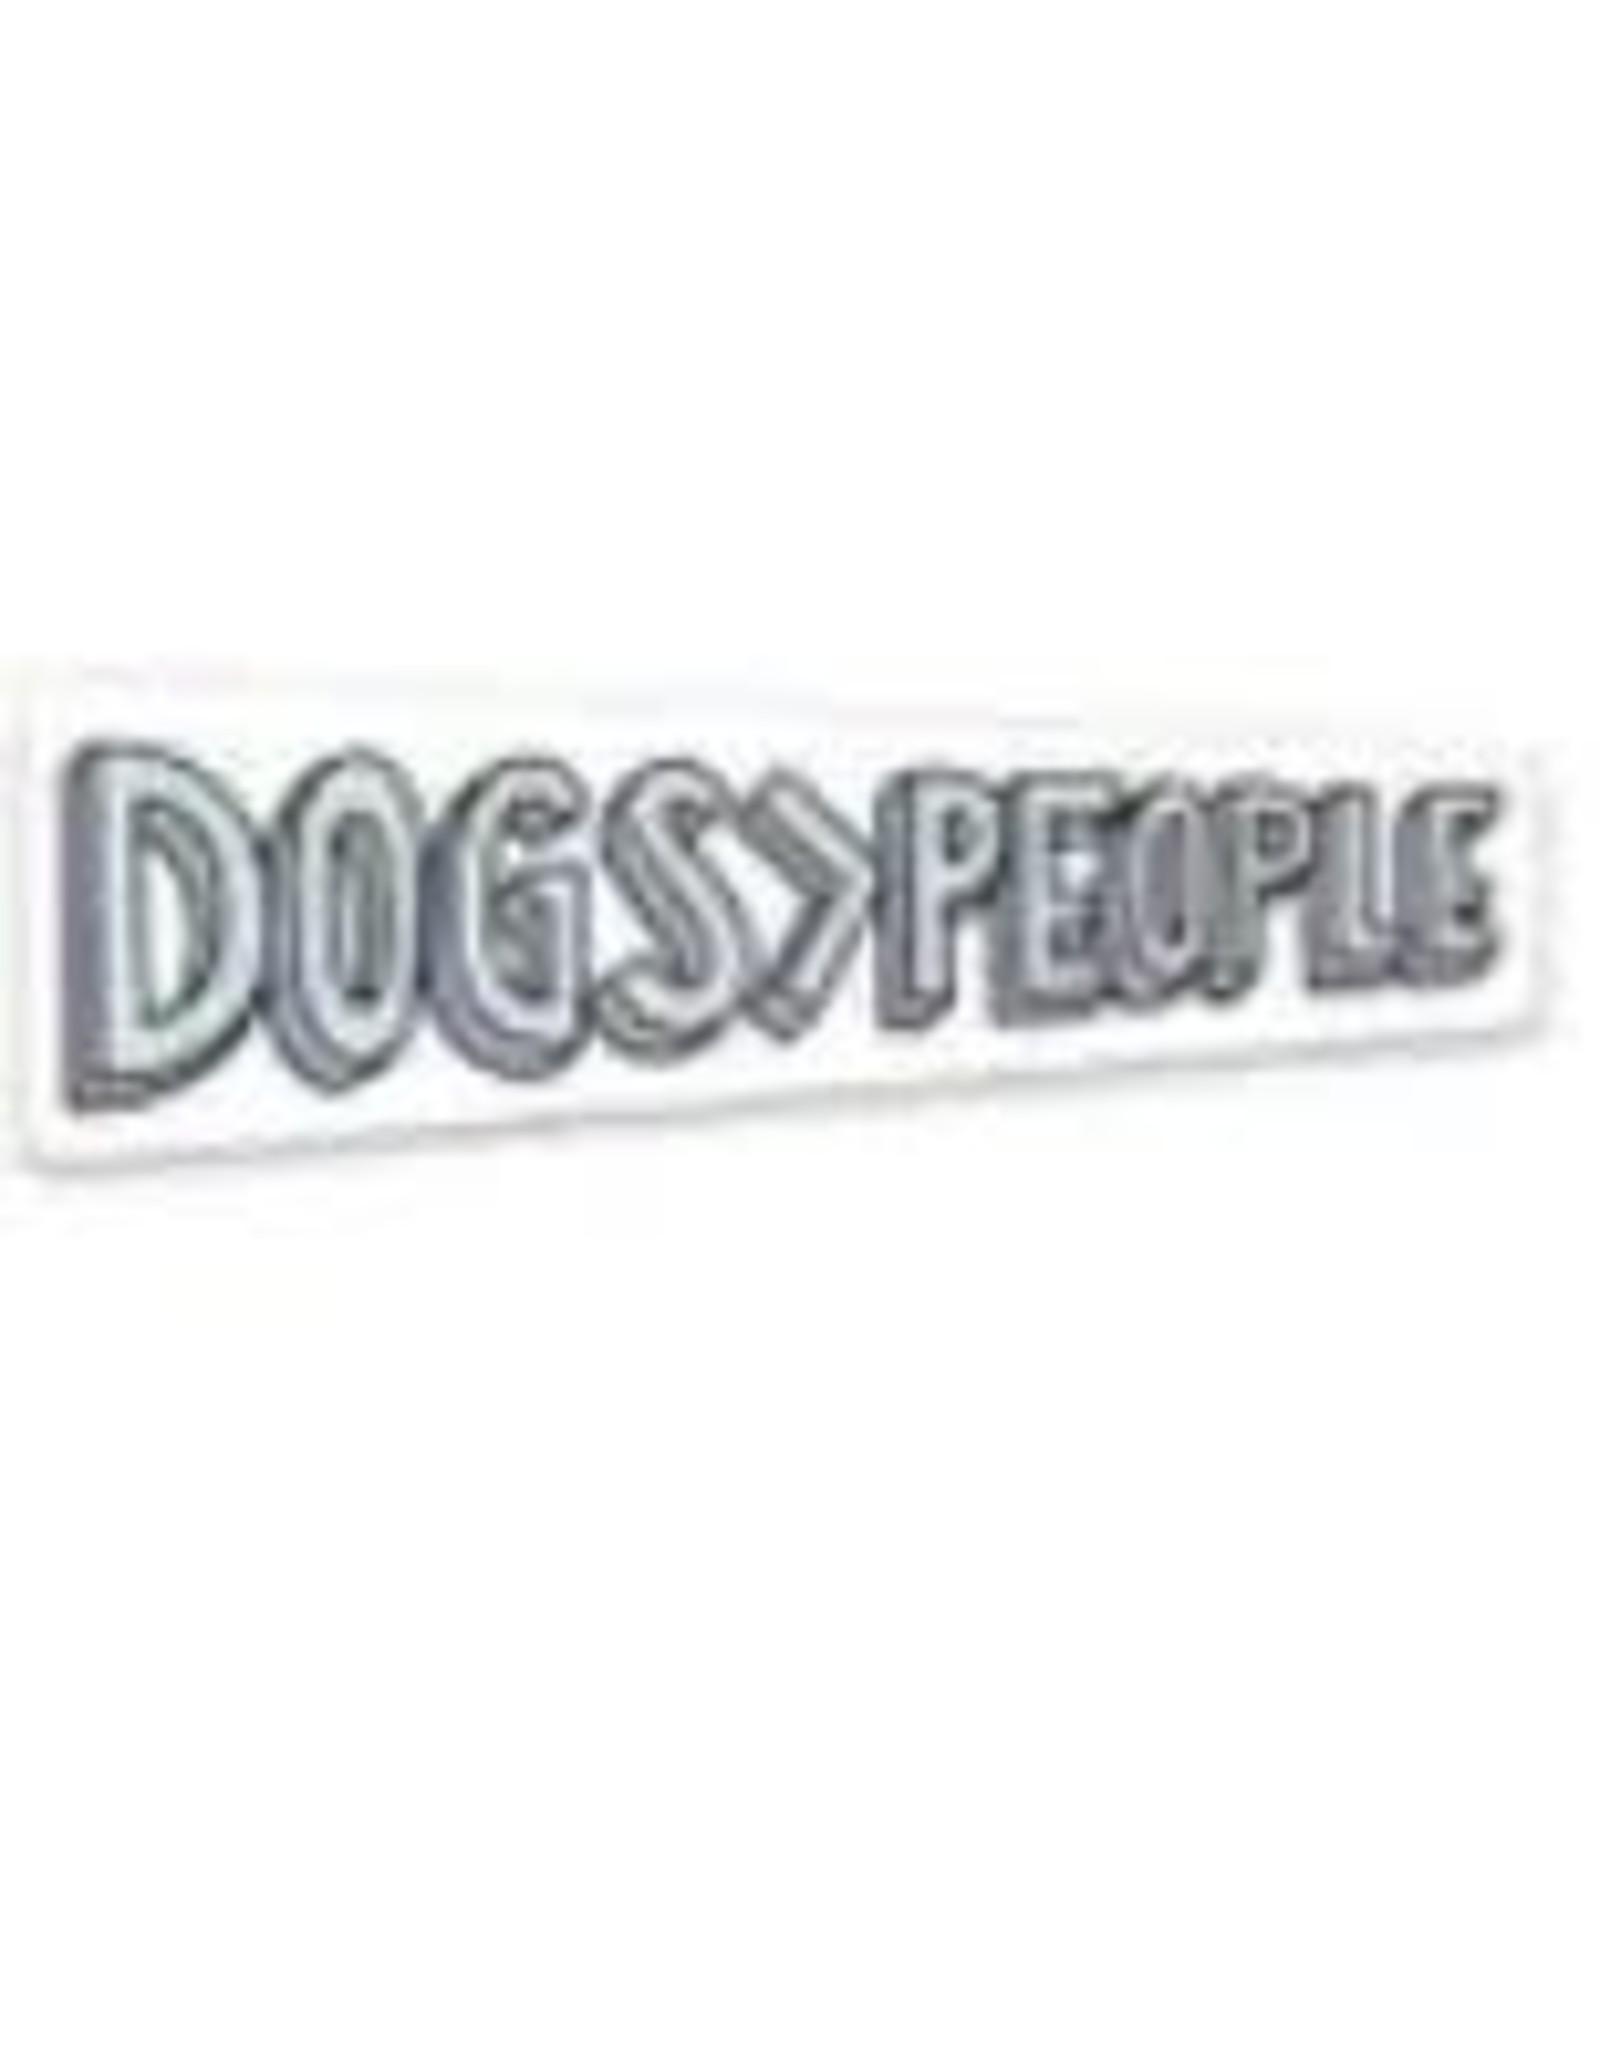 BIG MOODS DOGS PEOPLE STICKER